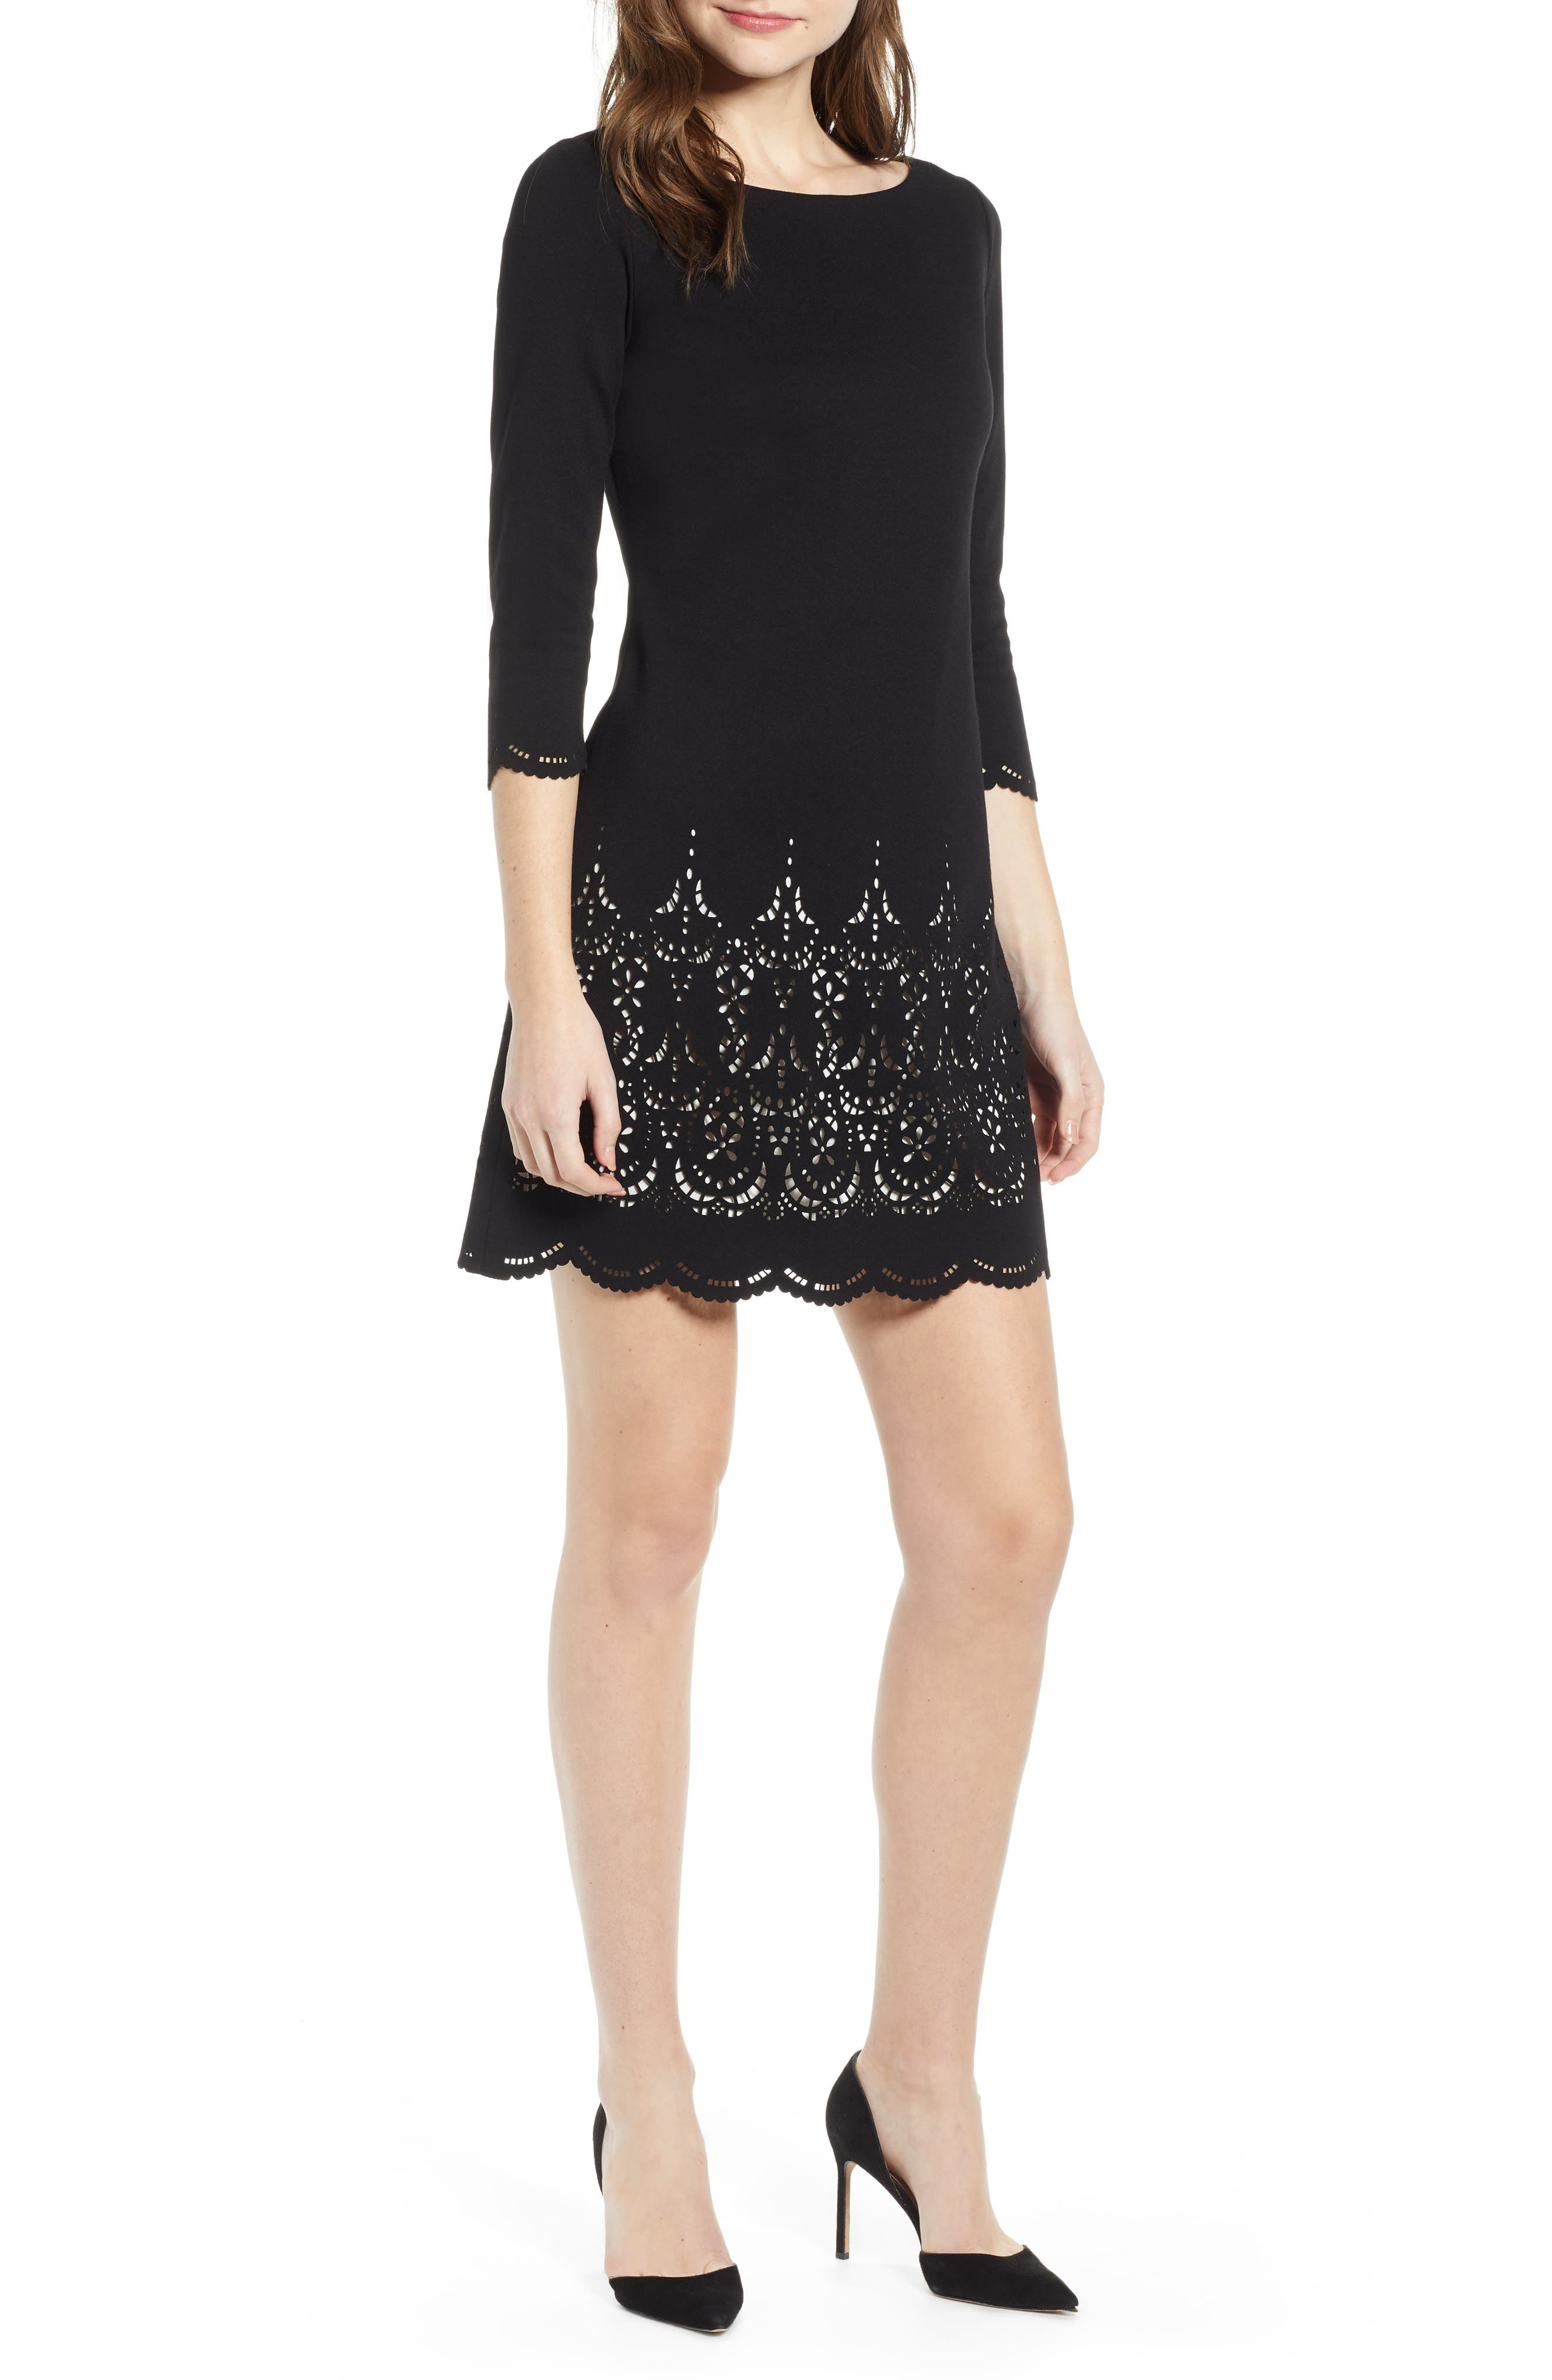 Bailey 44 Fondant Ponte Knit Dress, Black